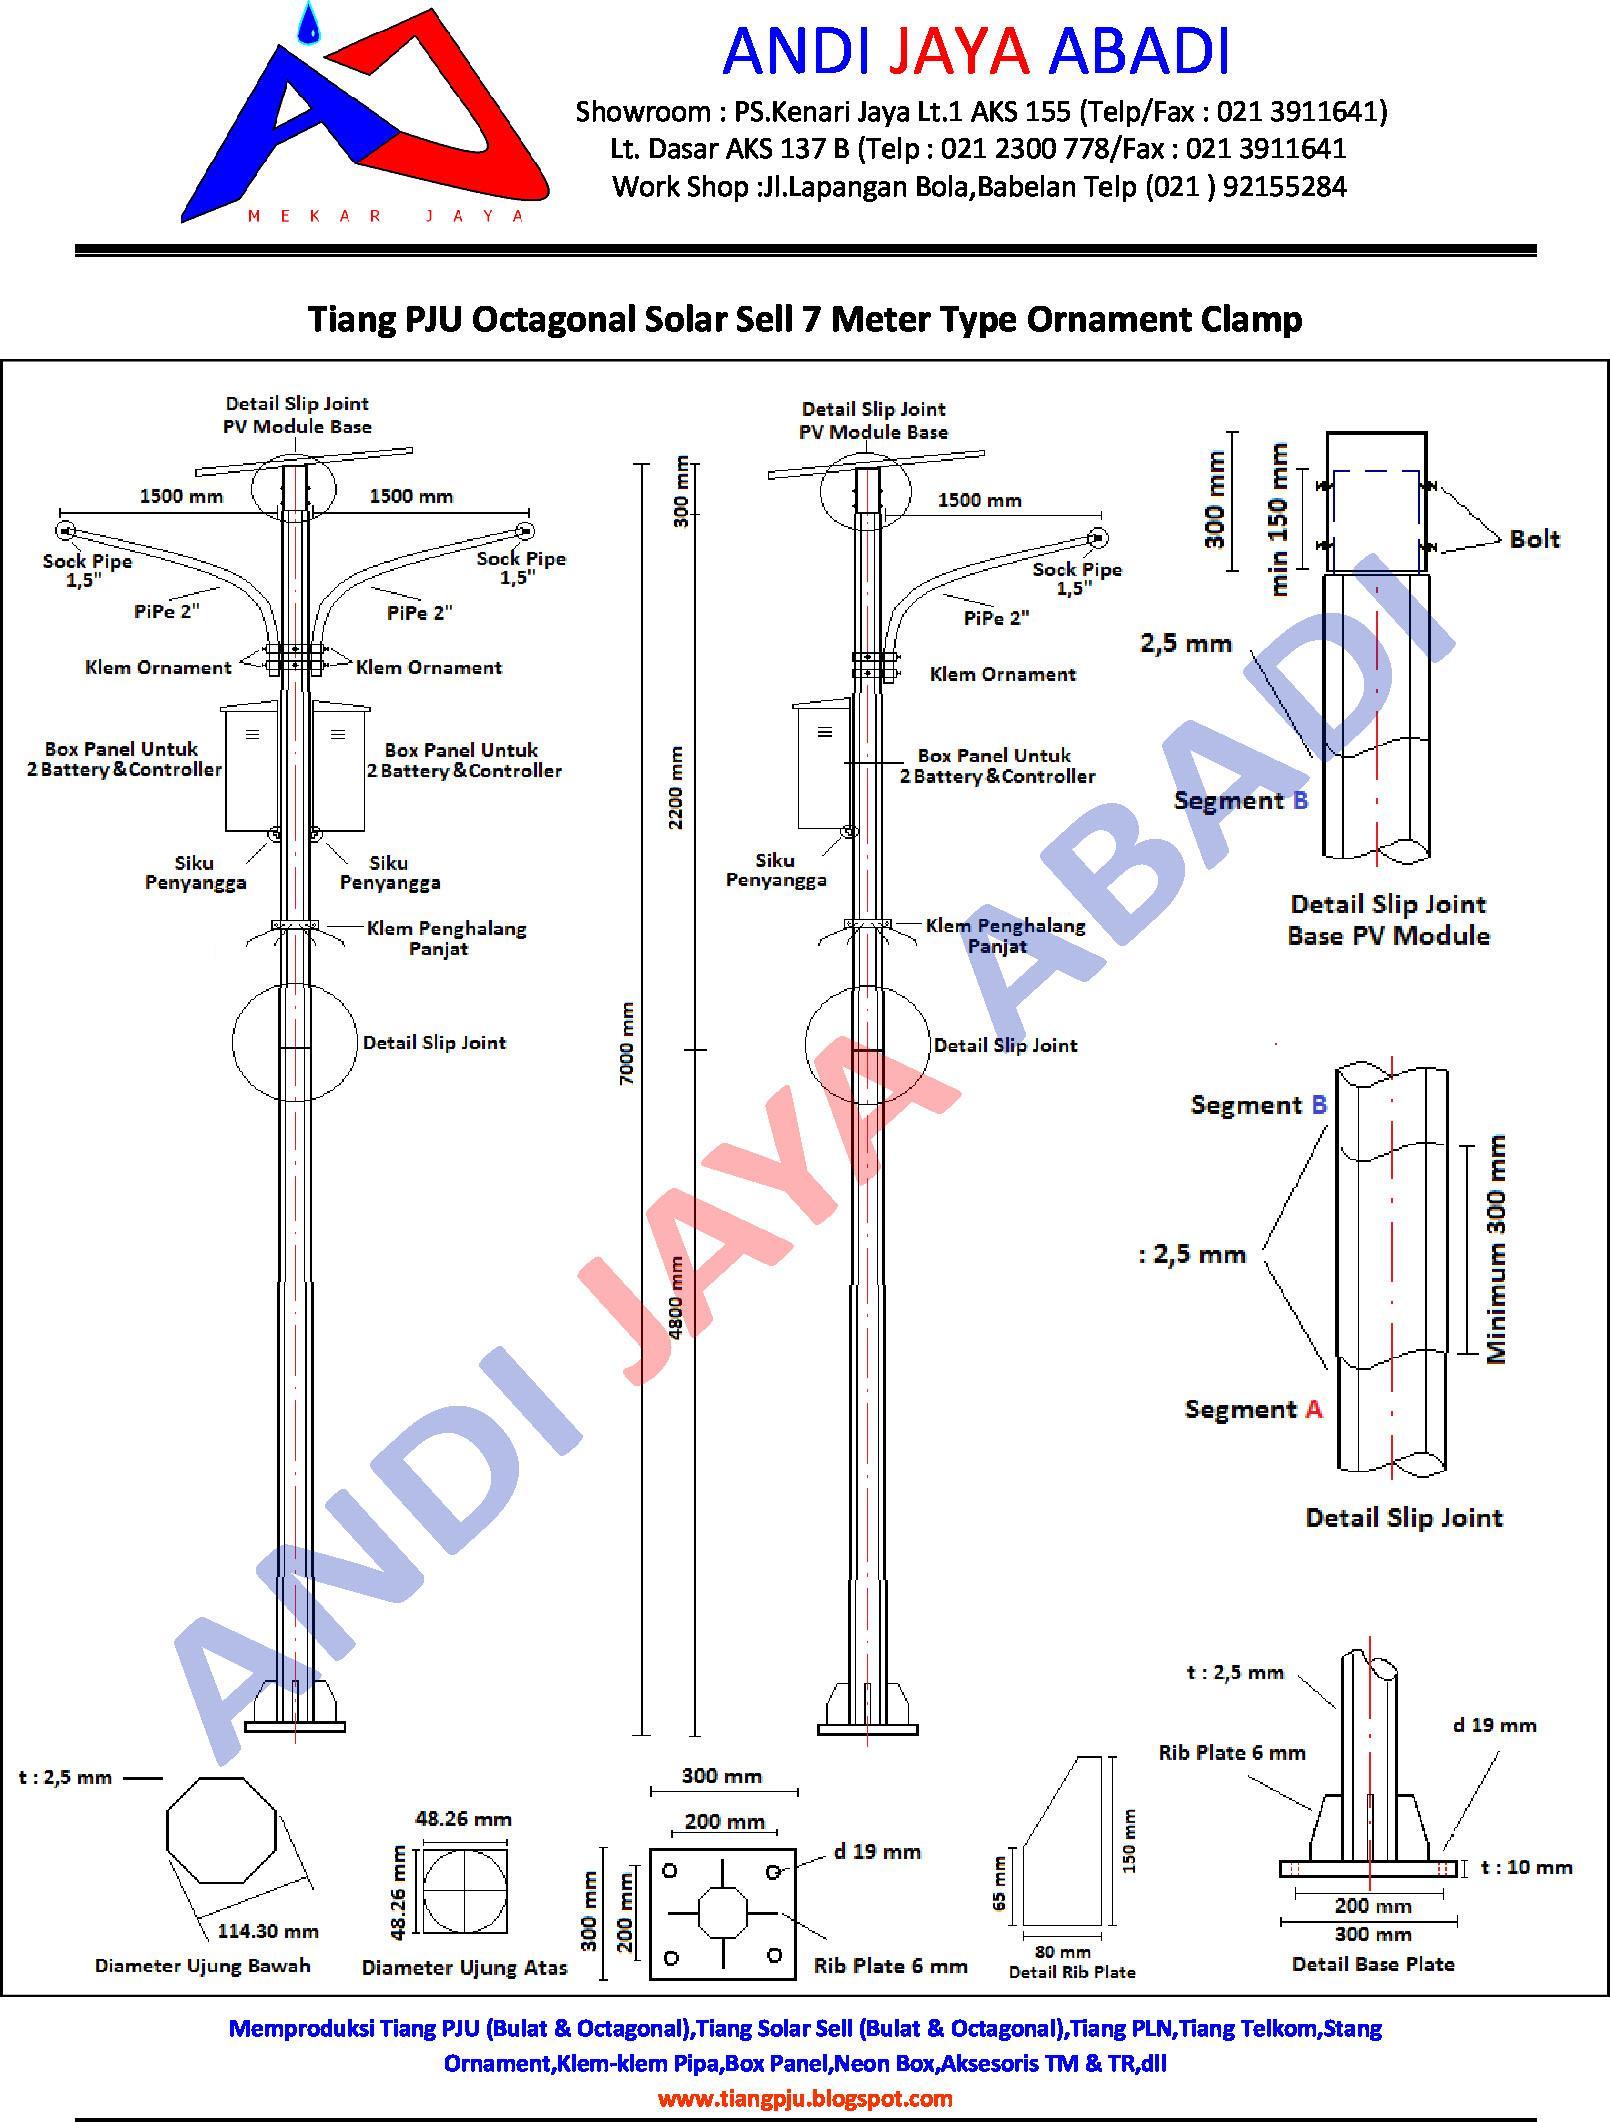 Jual Tiang Pju Solar Sell Octagonal Type Ornament Clamp 7